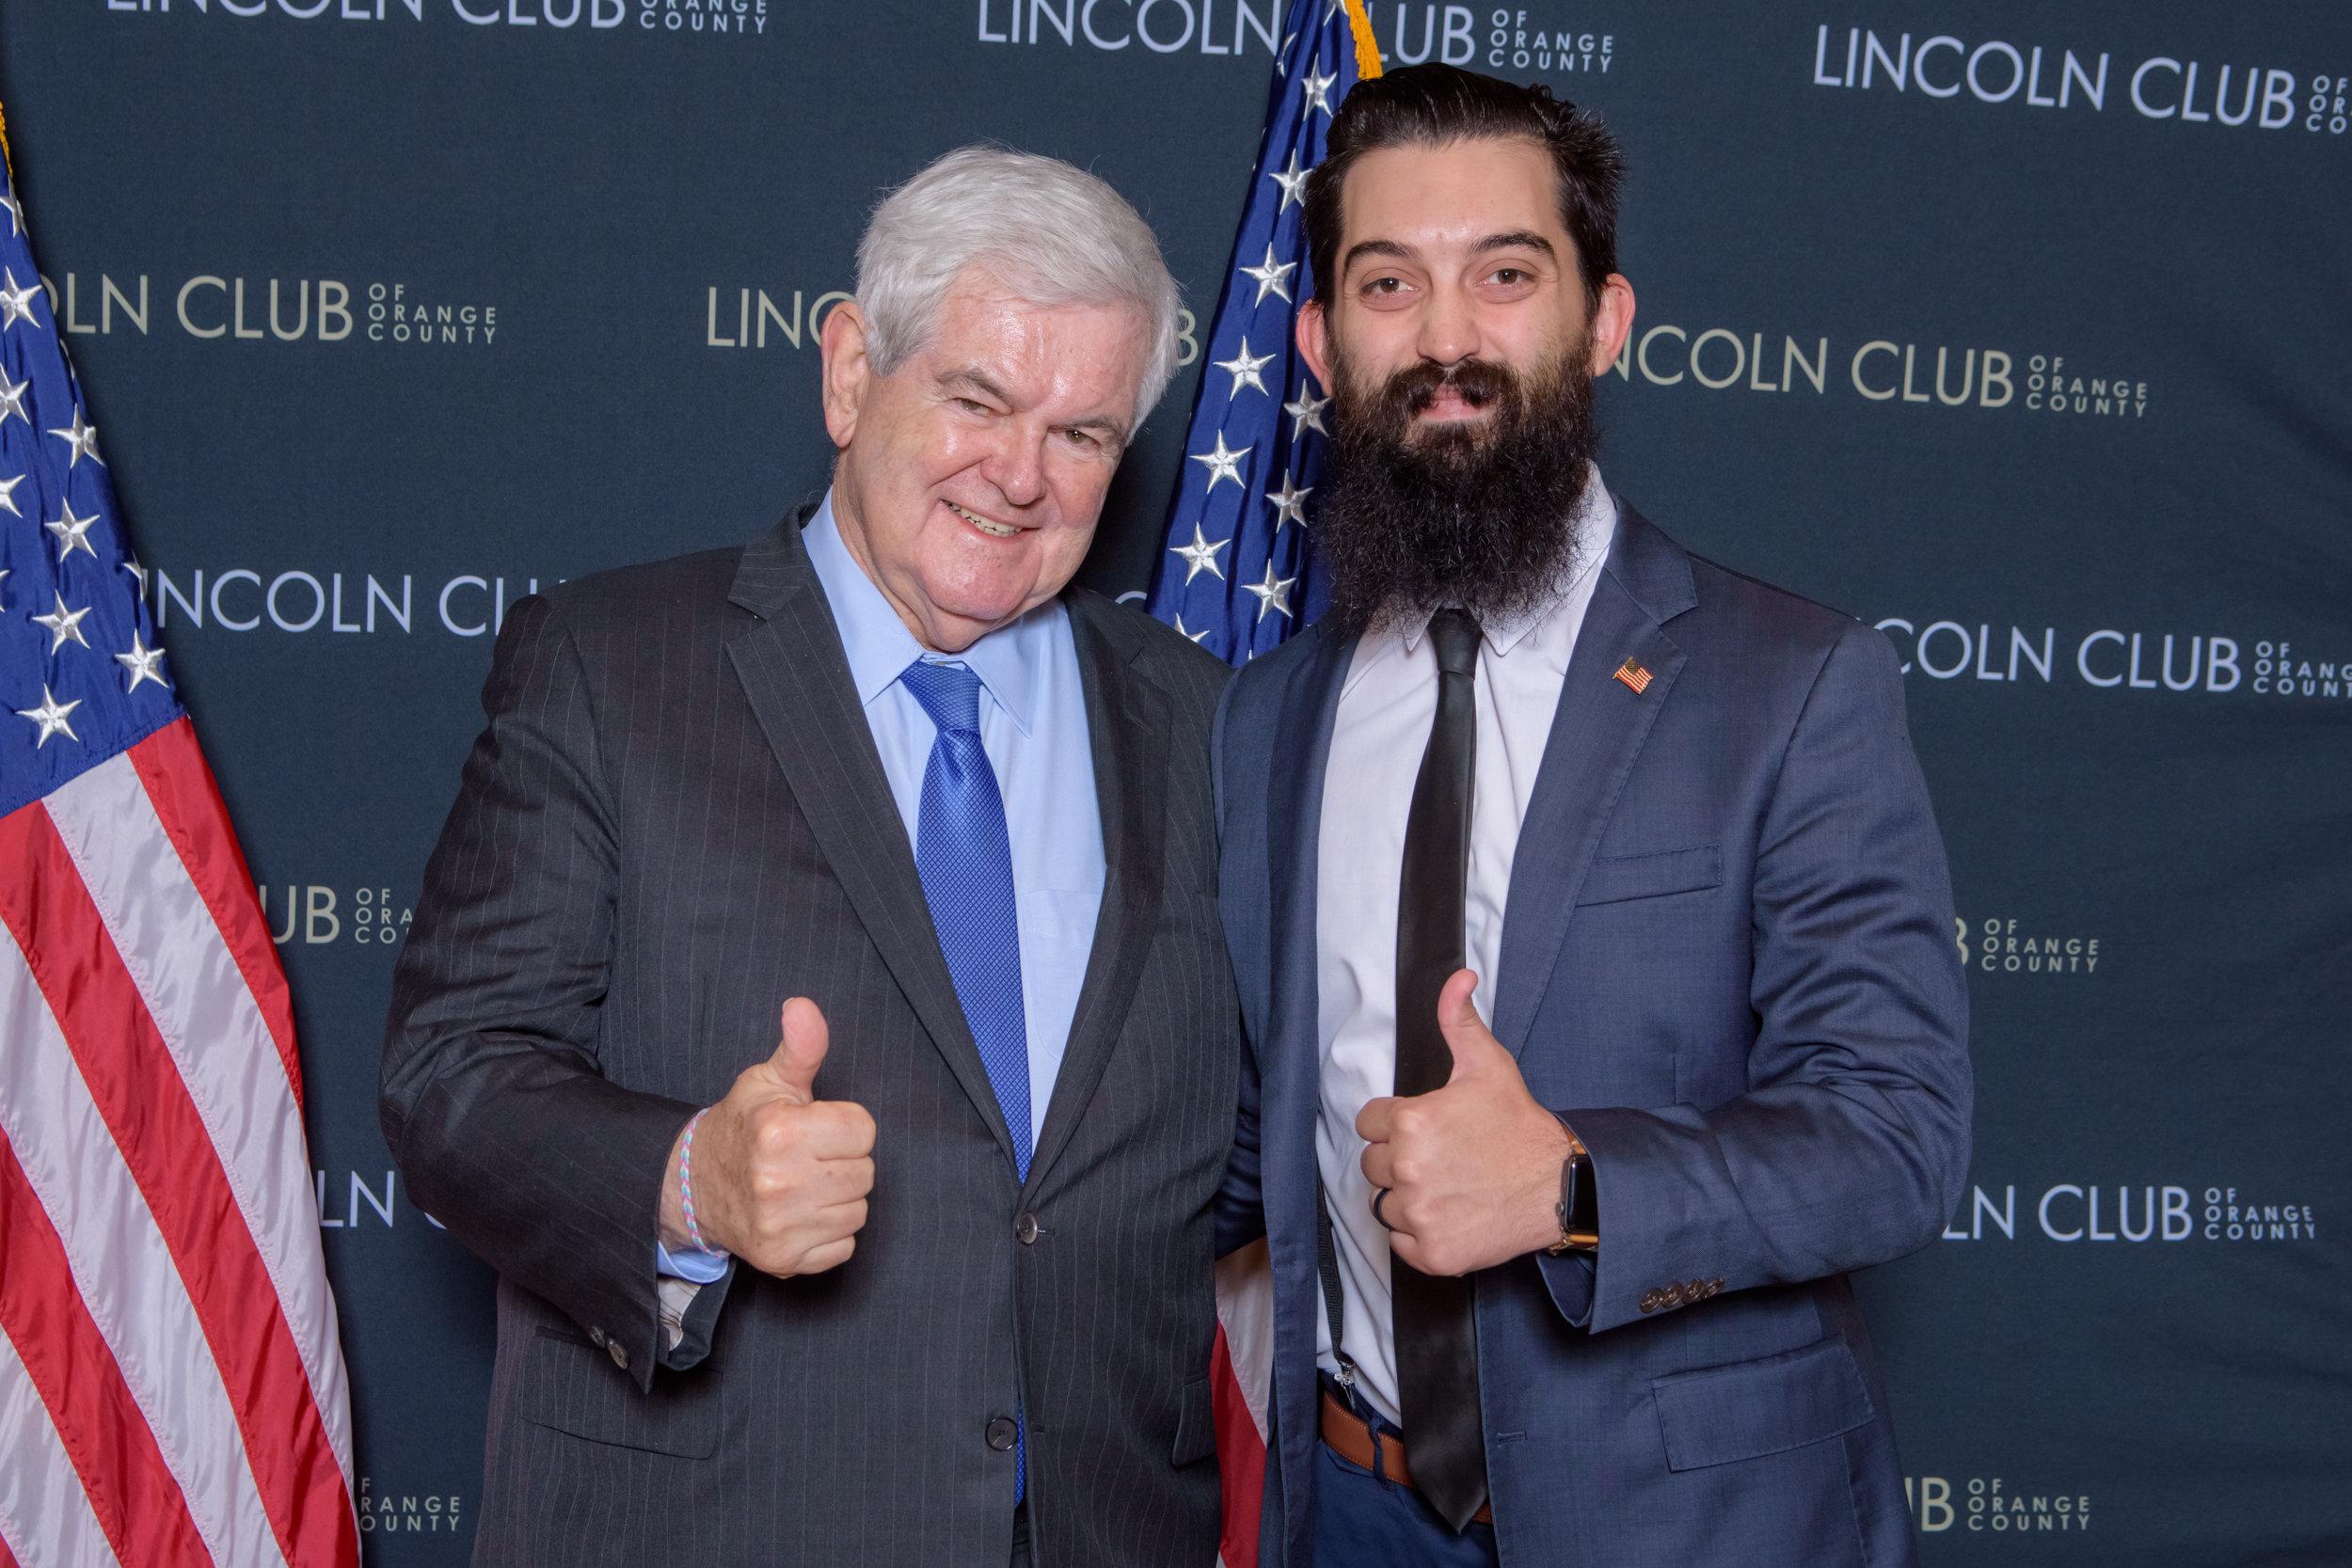 Newt Gingrich_Brian Harrington.JPG